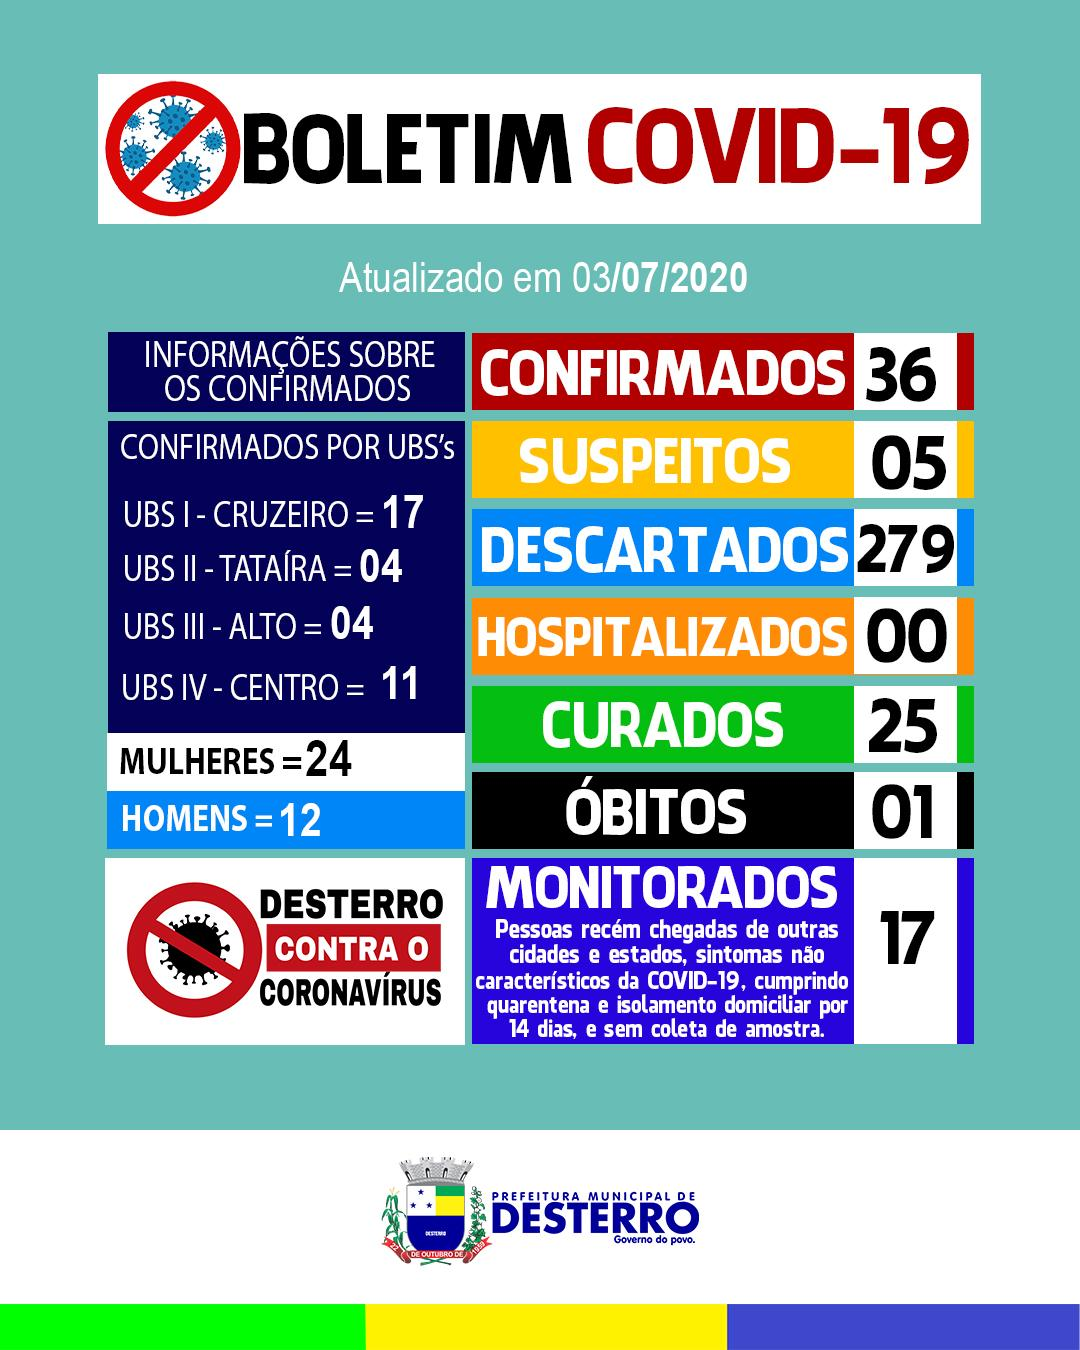 Boletim Covid-19 (03/07/2020)